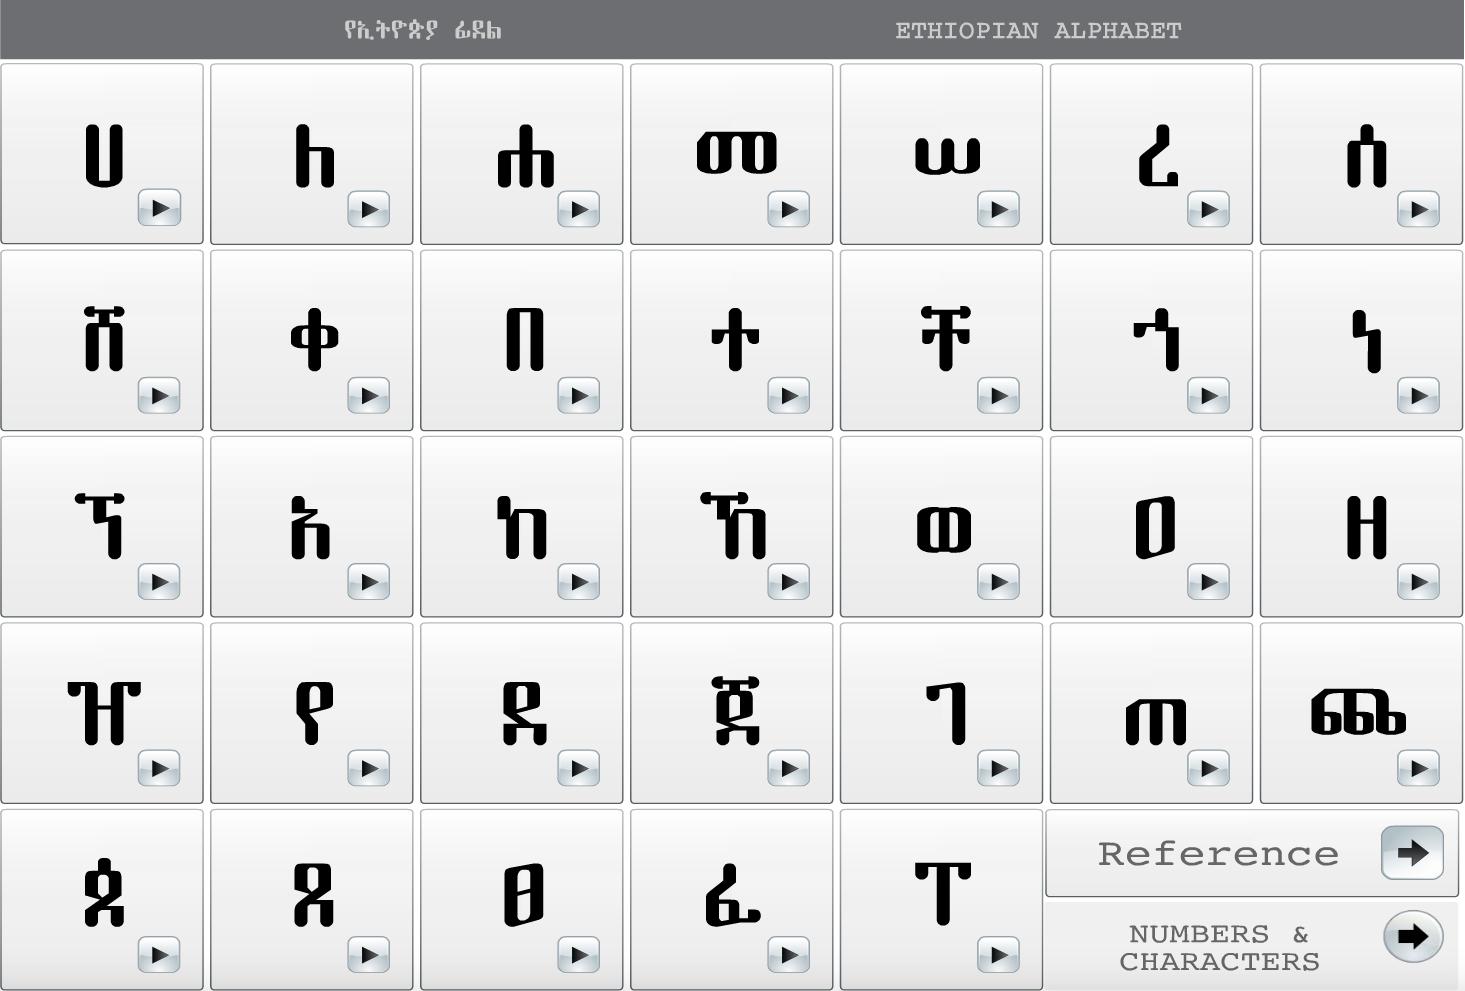 Amazon com: Ethiopian Alphabet [Download]: Software